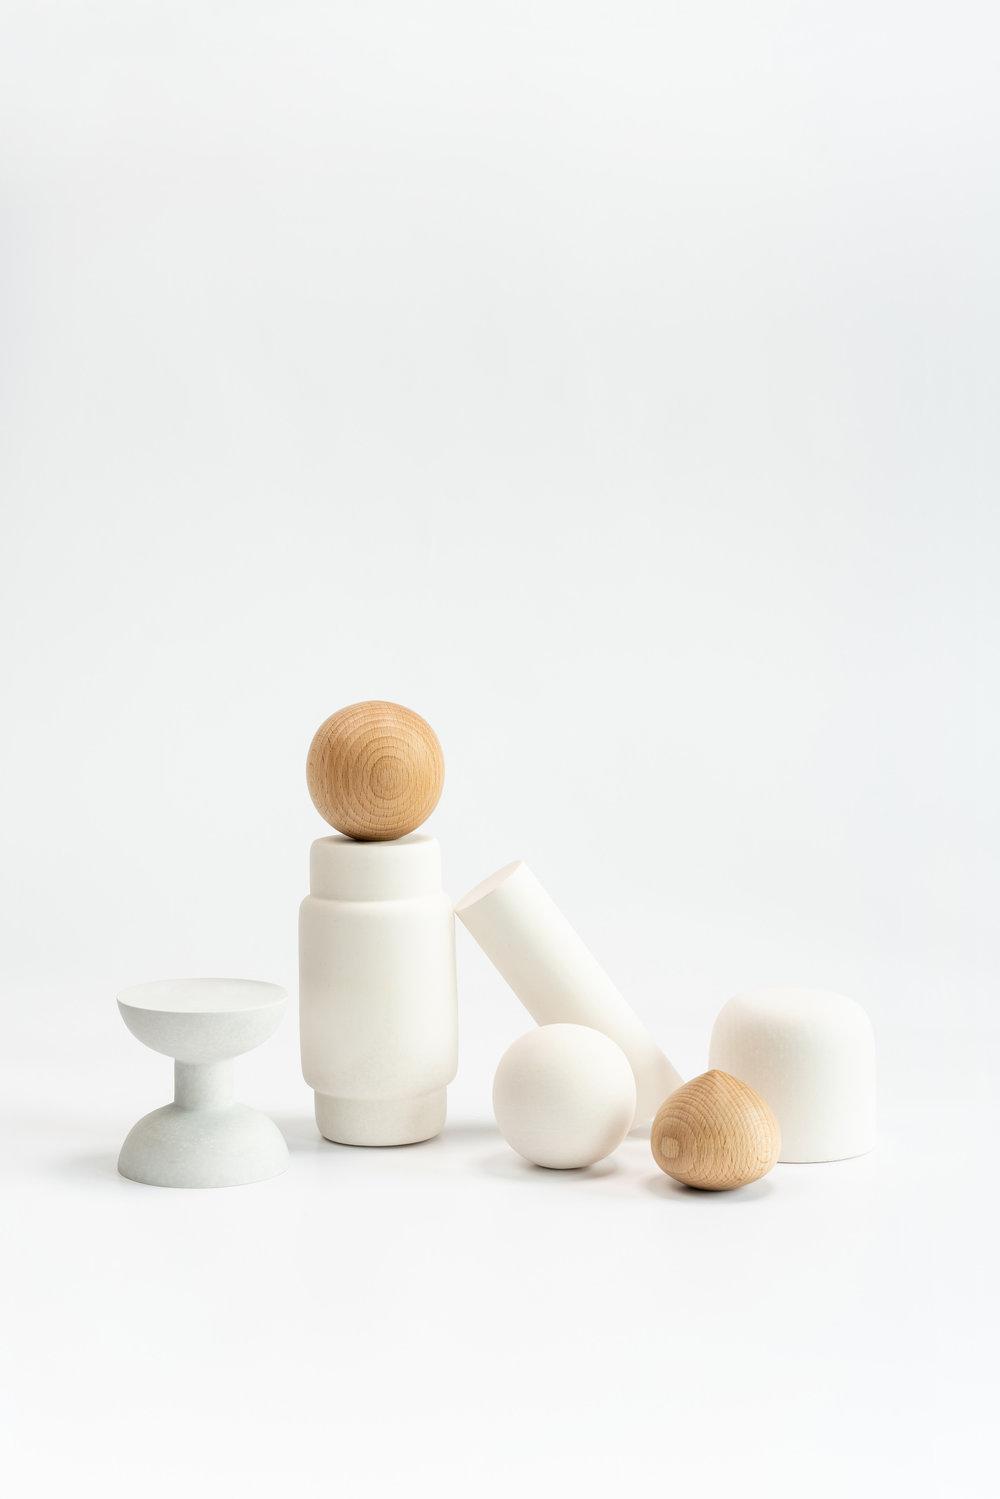 15.06.18 - Anna Manfield Design - Arrangements 2.jpg